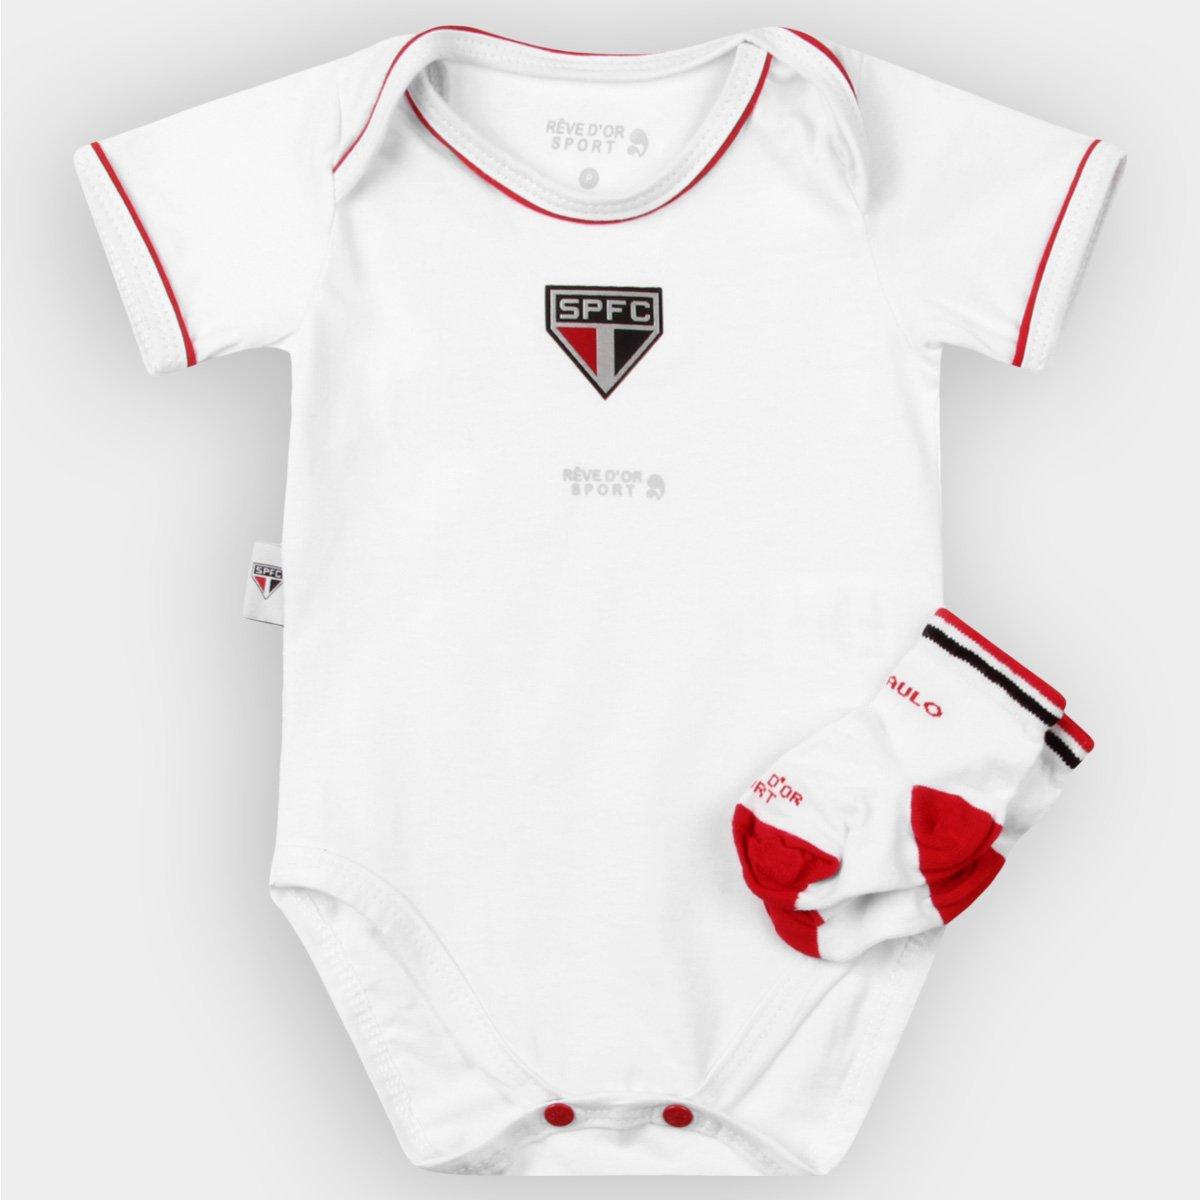 3fdb9d1a343 Kit São Paulo Bebê Body Vivos e Meia - Compre Agora